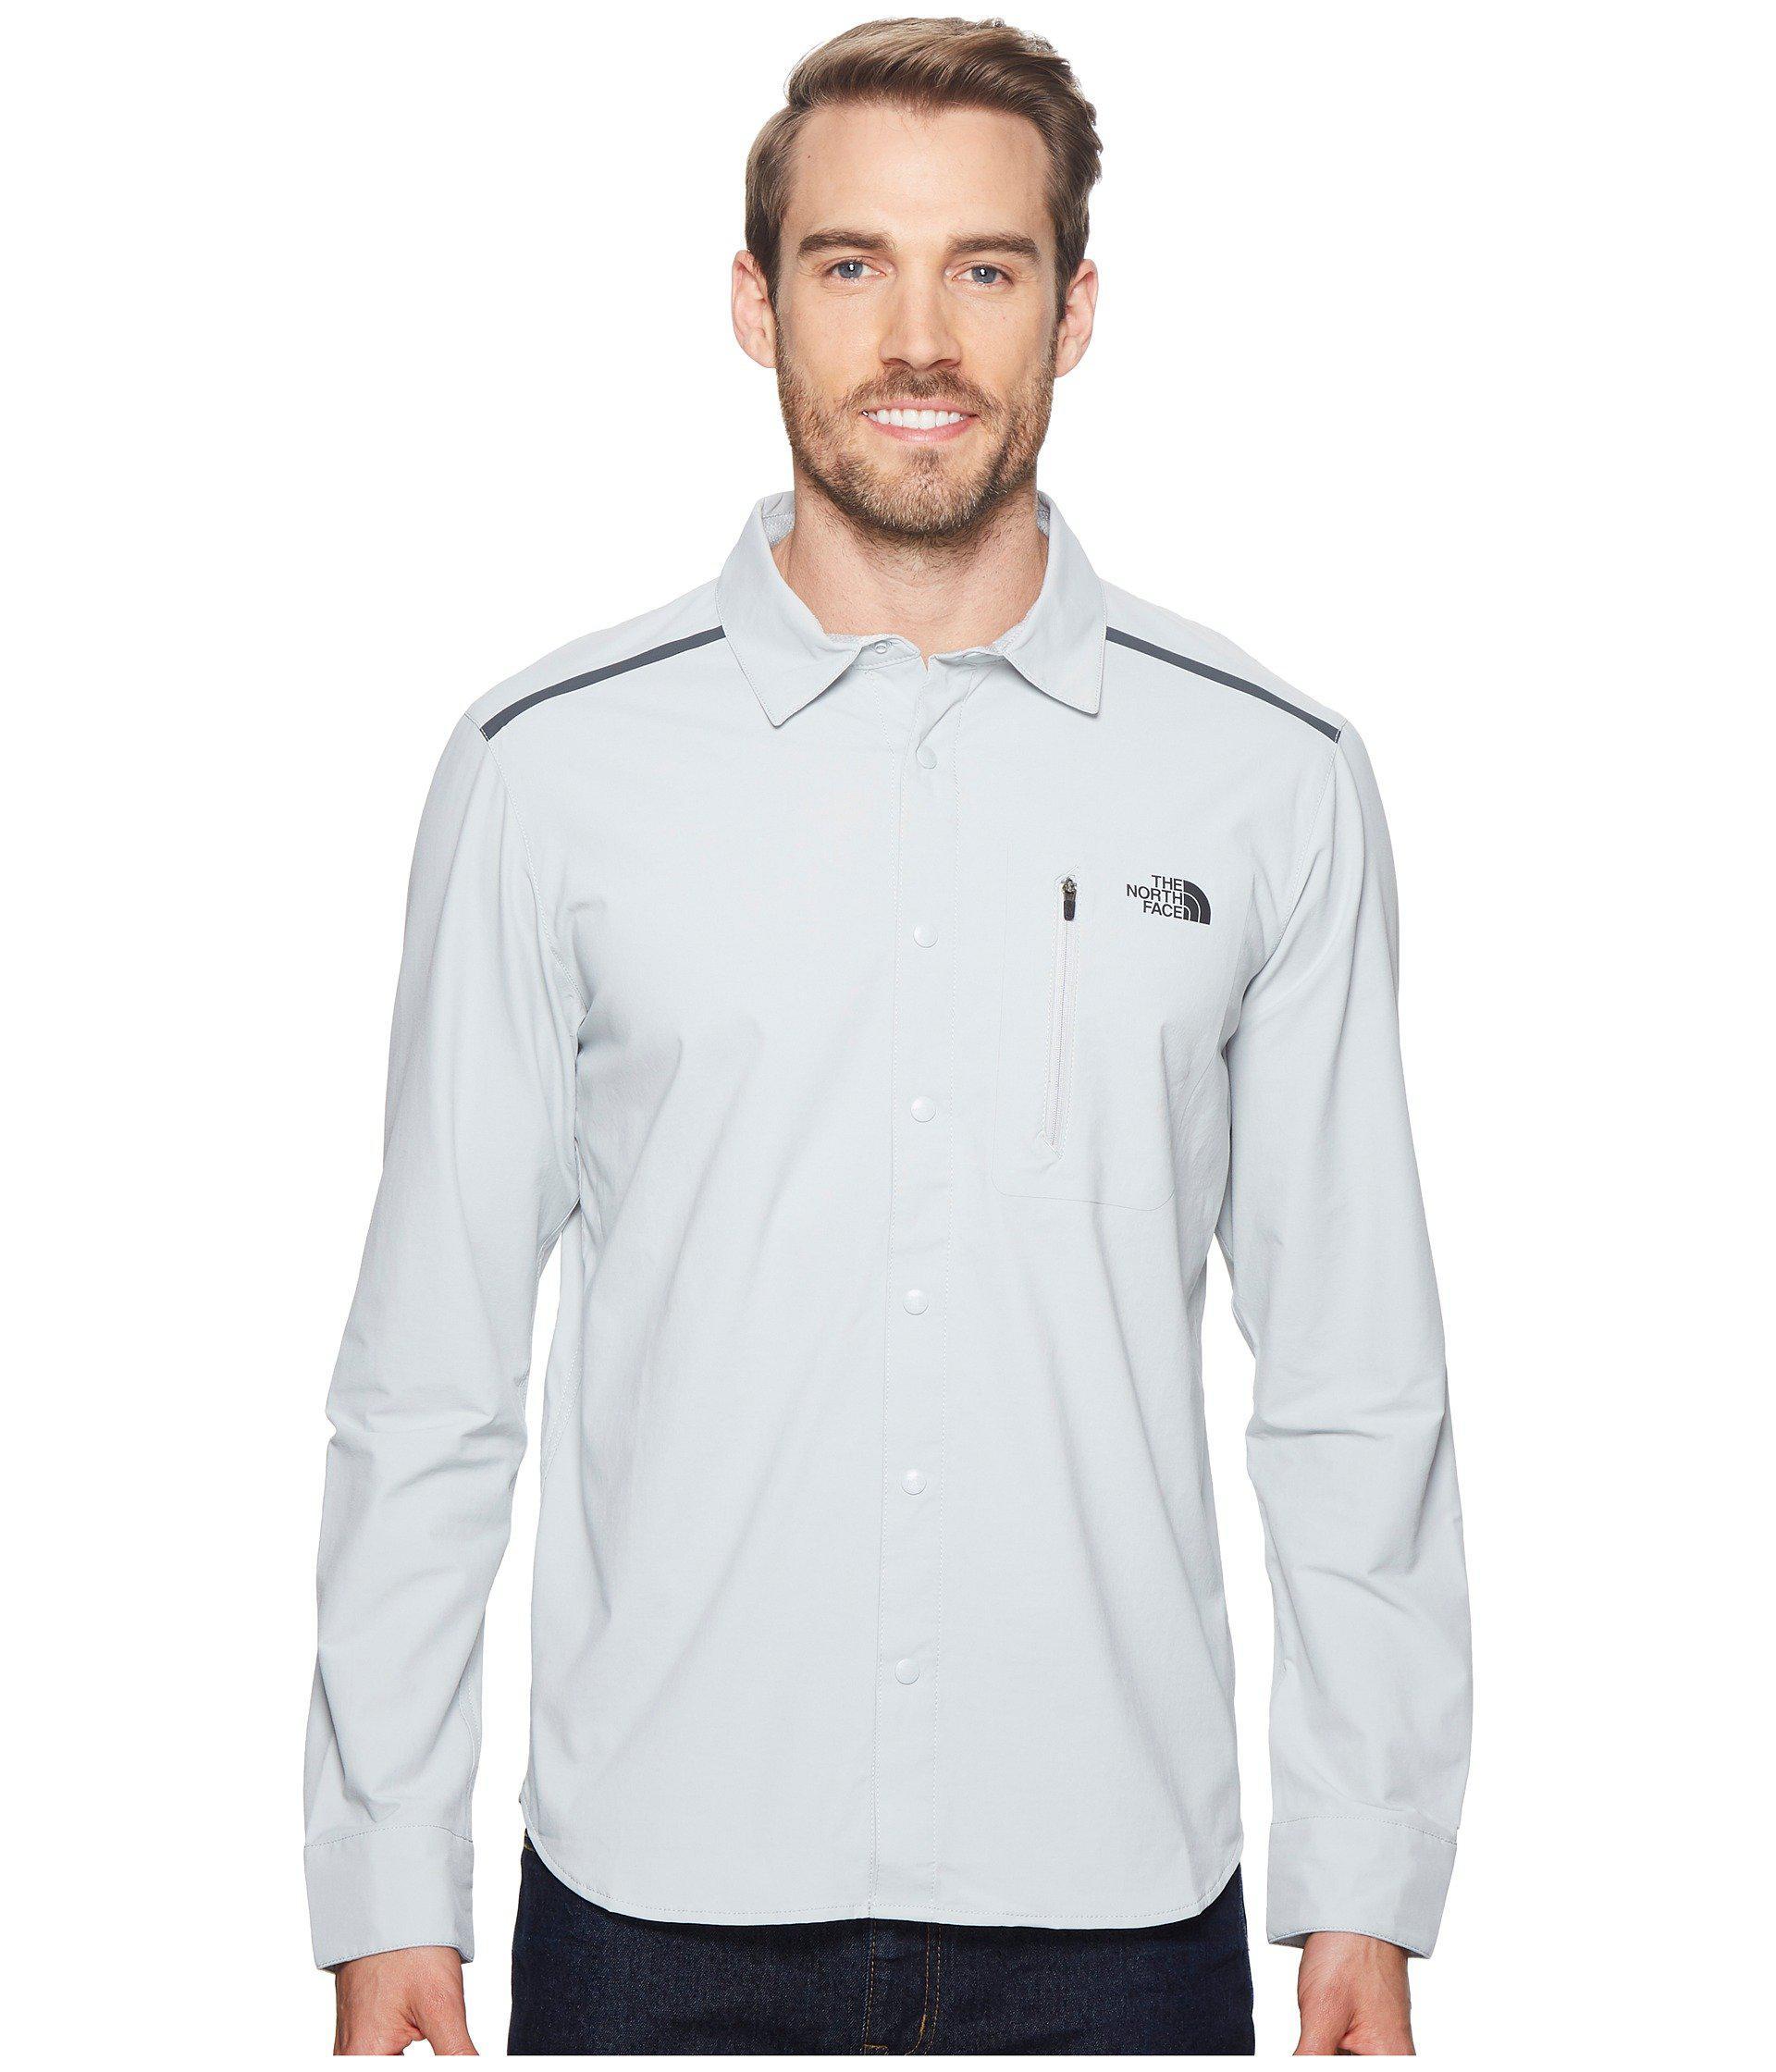 0cd6b086b The North Face Gray Alpenbro Long Sleeve Woven Shirt for men